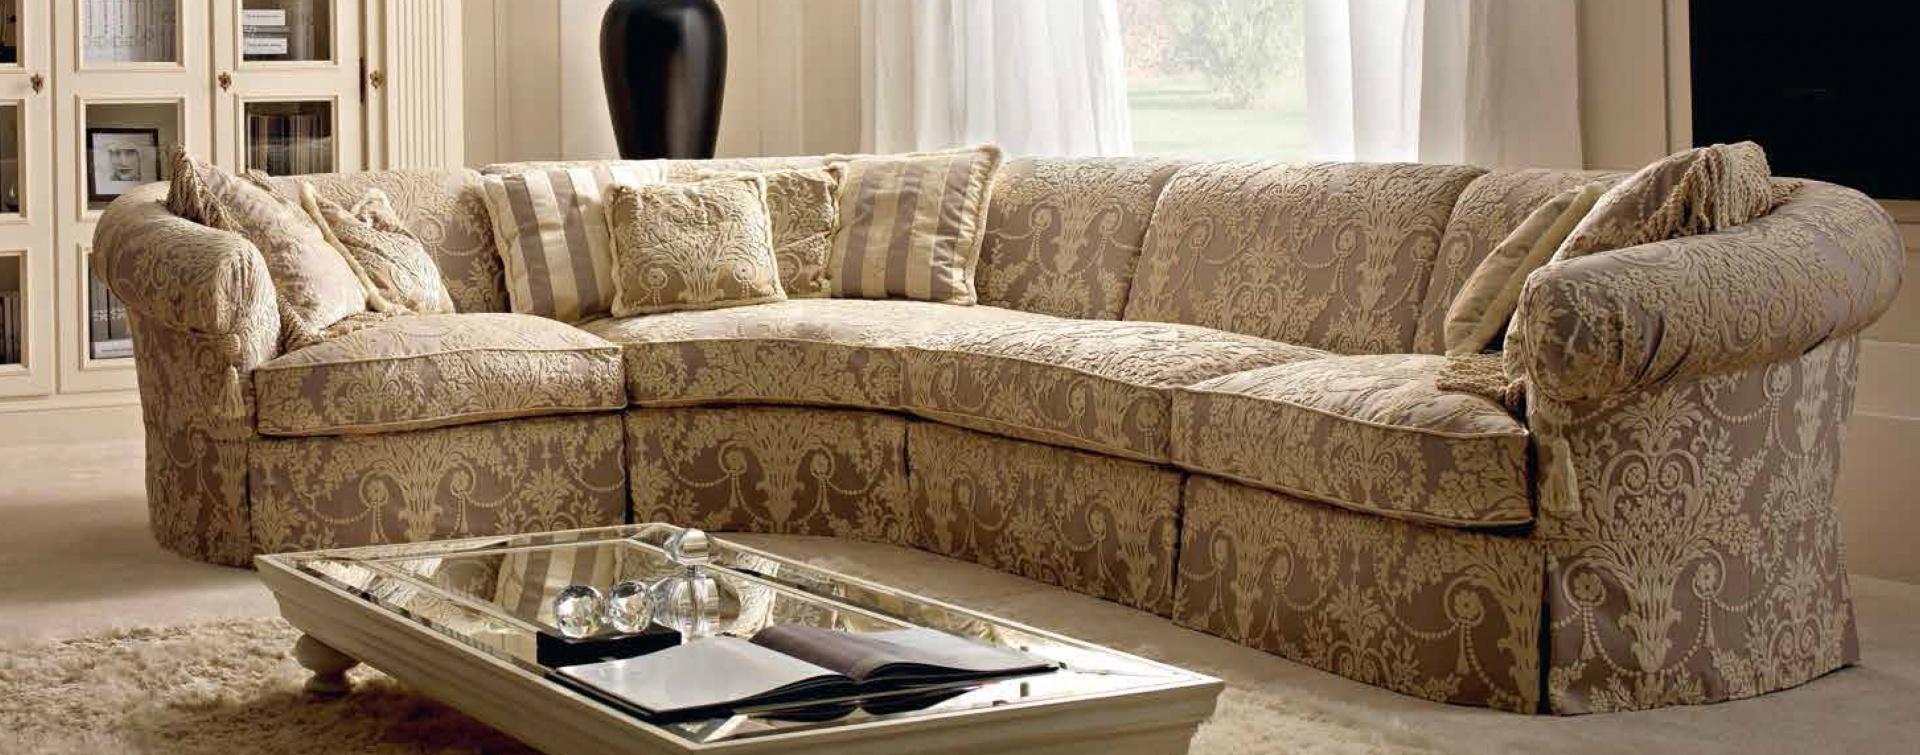 Charlotte диван угловой CHARLOTTE CHARLOTTE